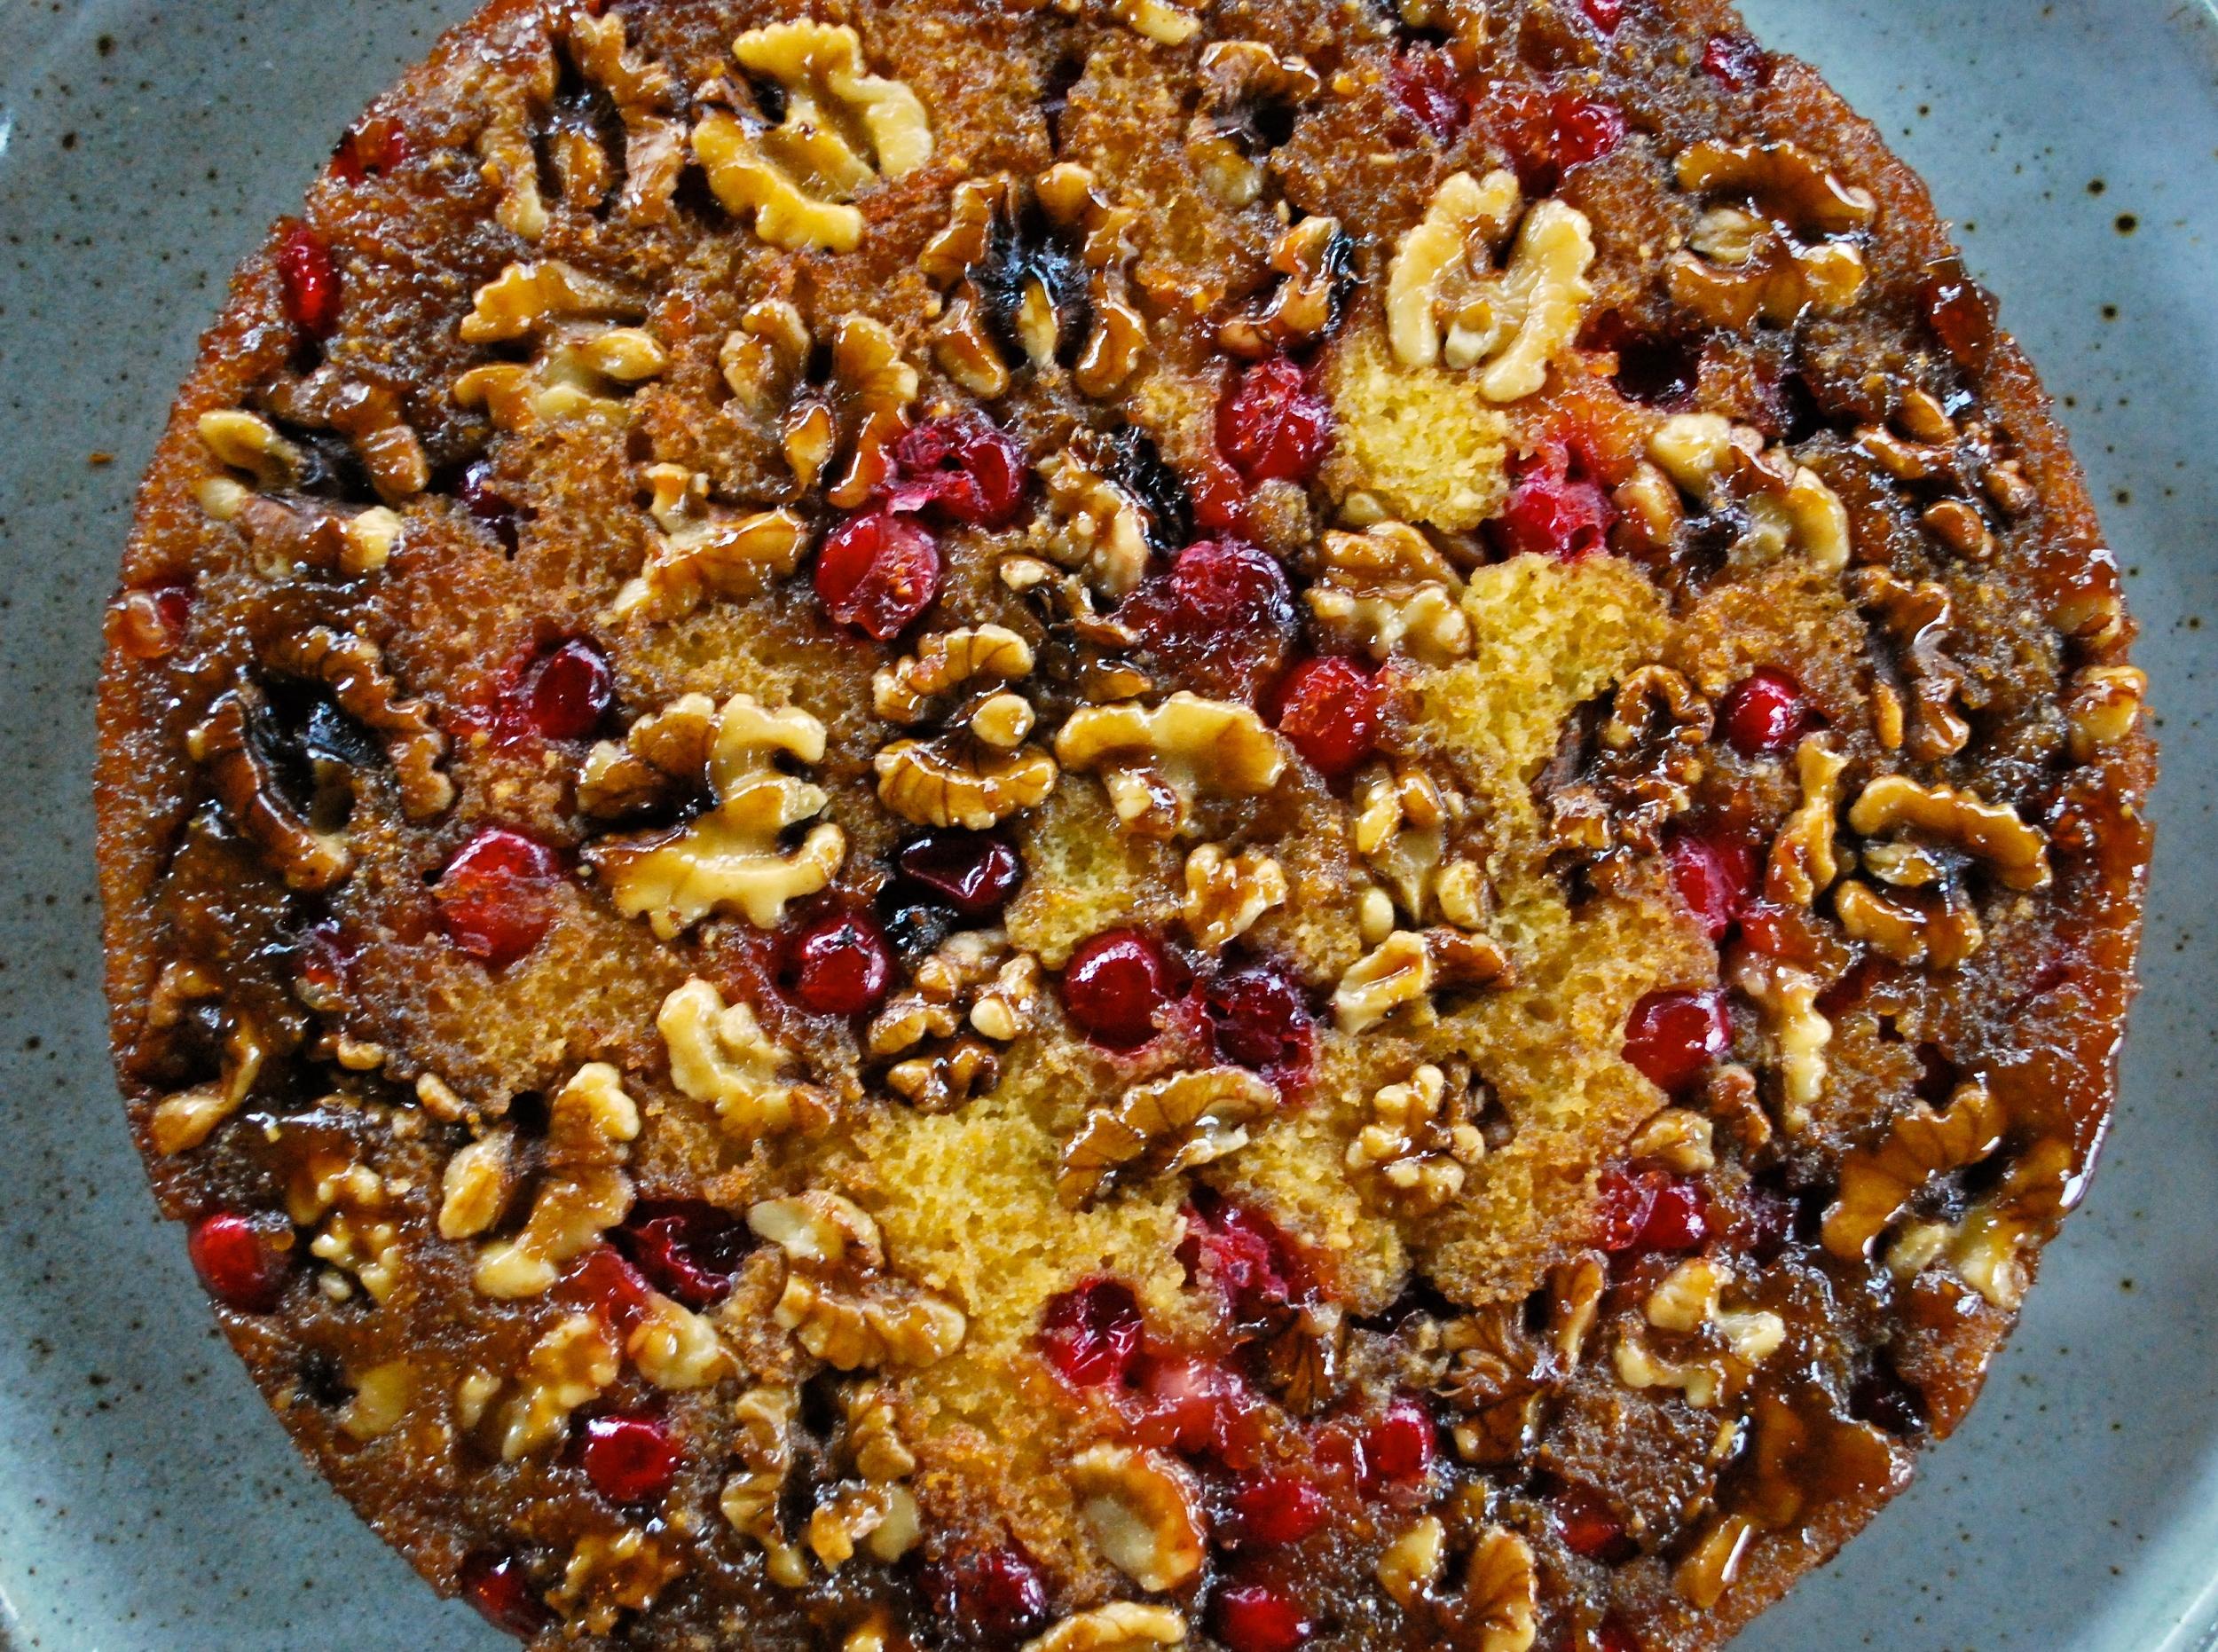 Organic Valley Cranberry Walnut Cake